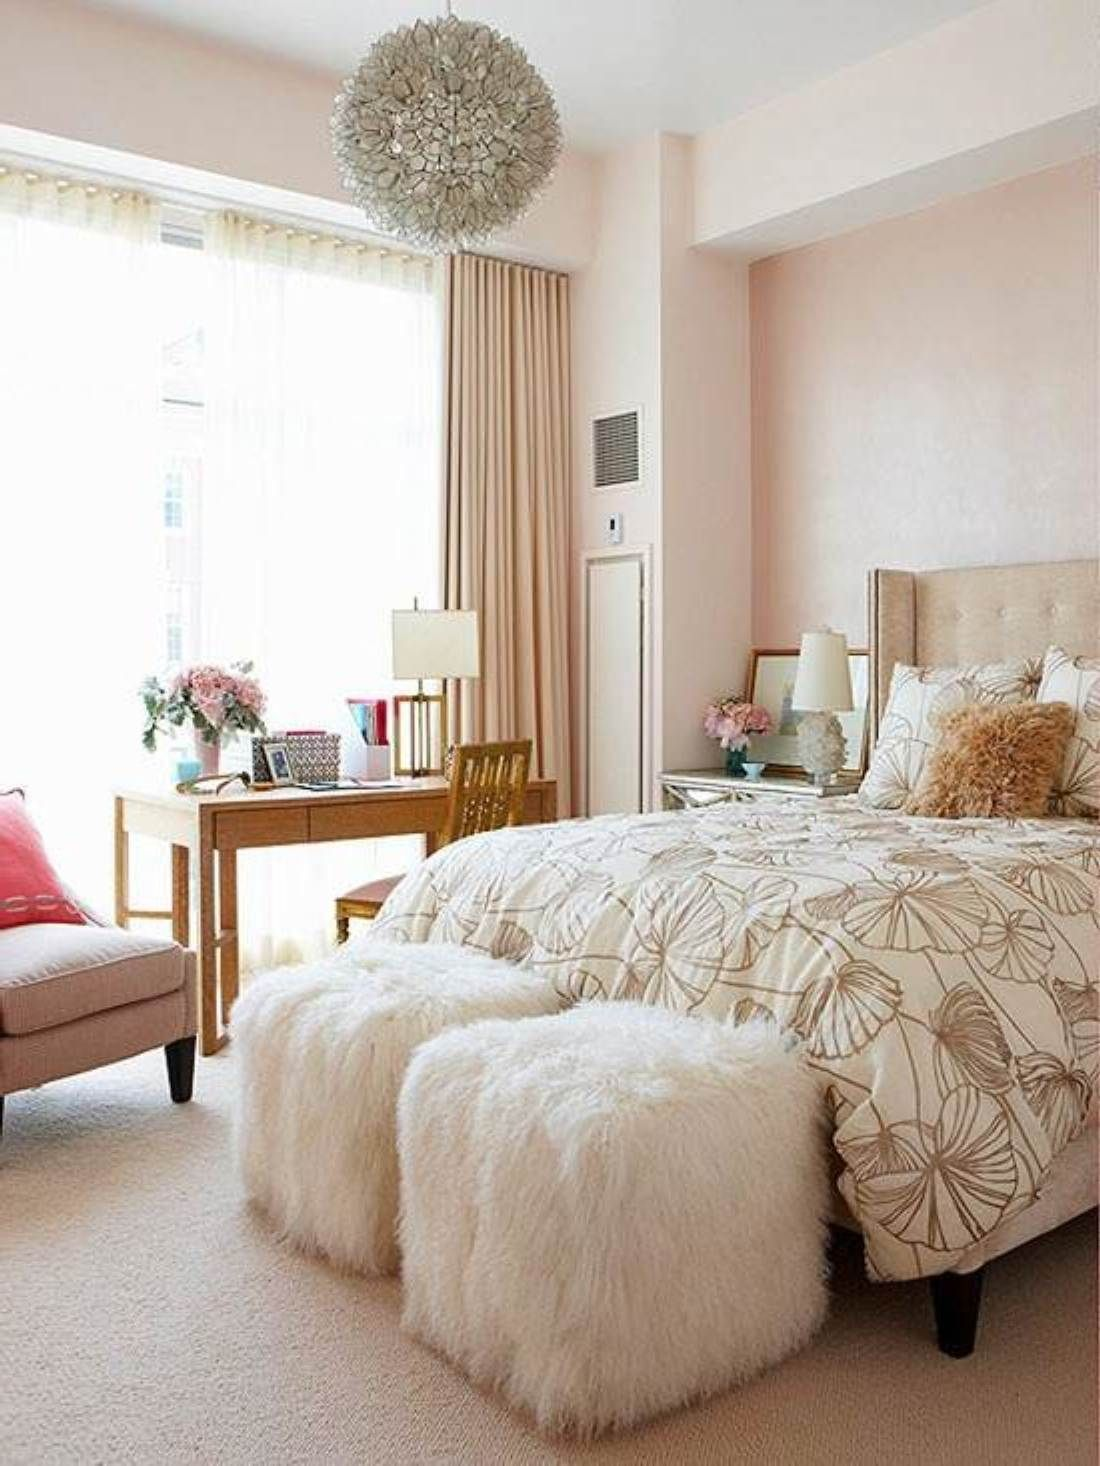 Pin By Alondra Diaz On New Room Ideas Champagne Bedroom Woman Bedroom Elegant Bedroom